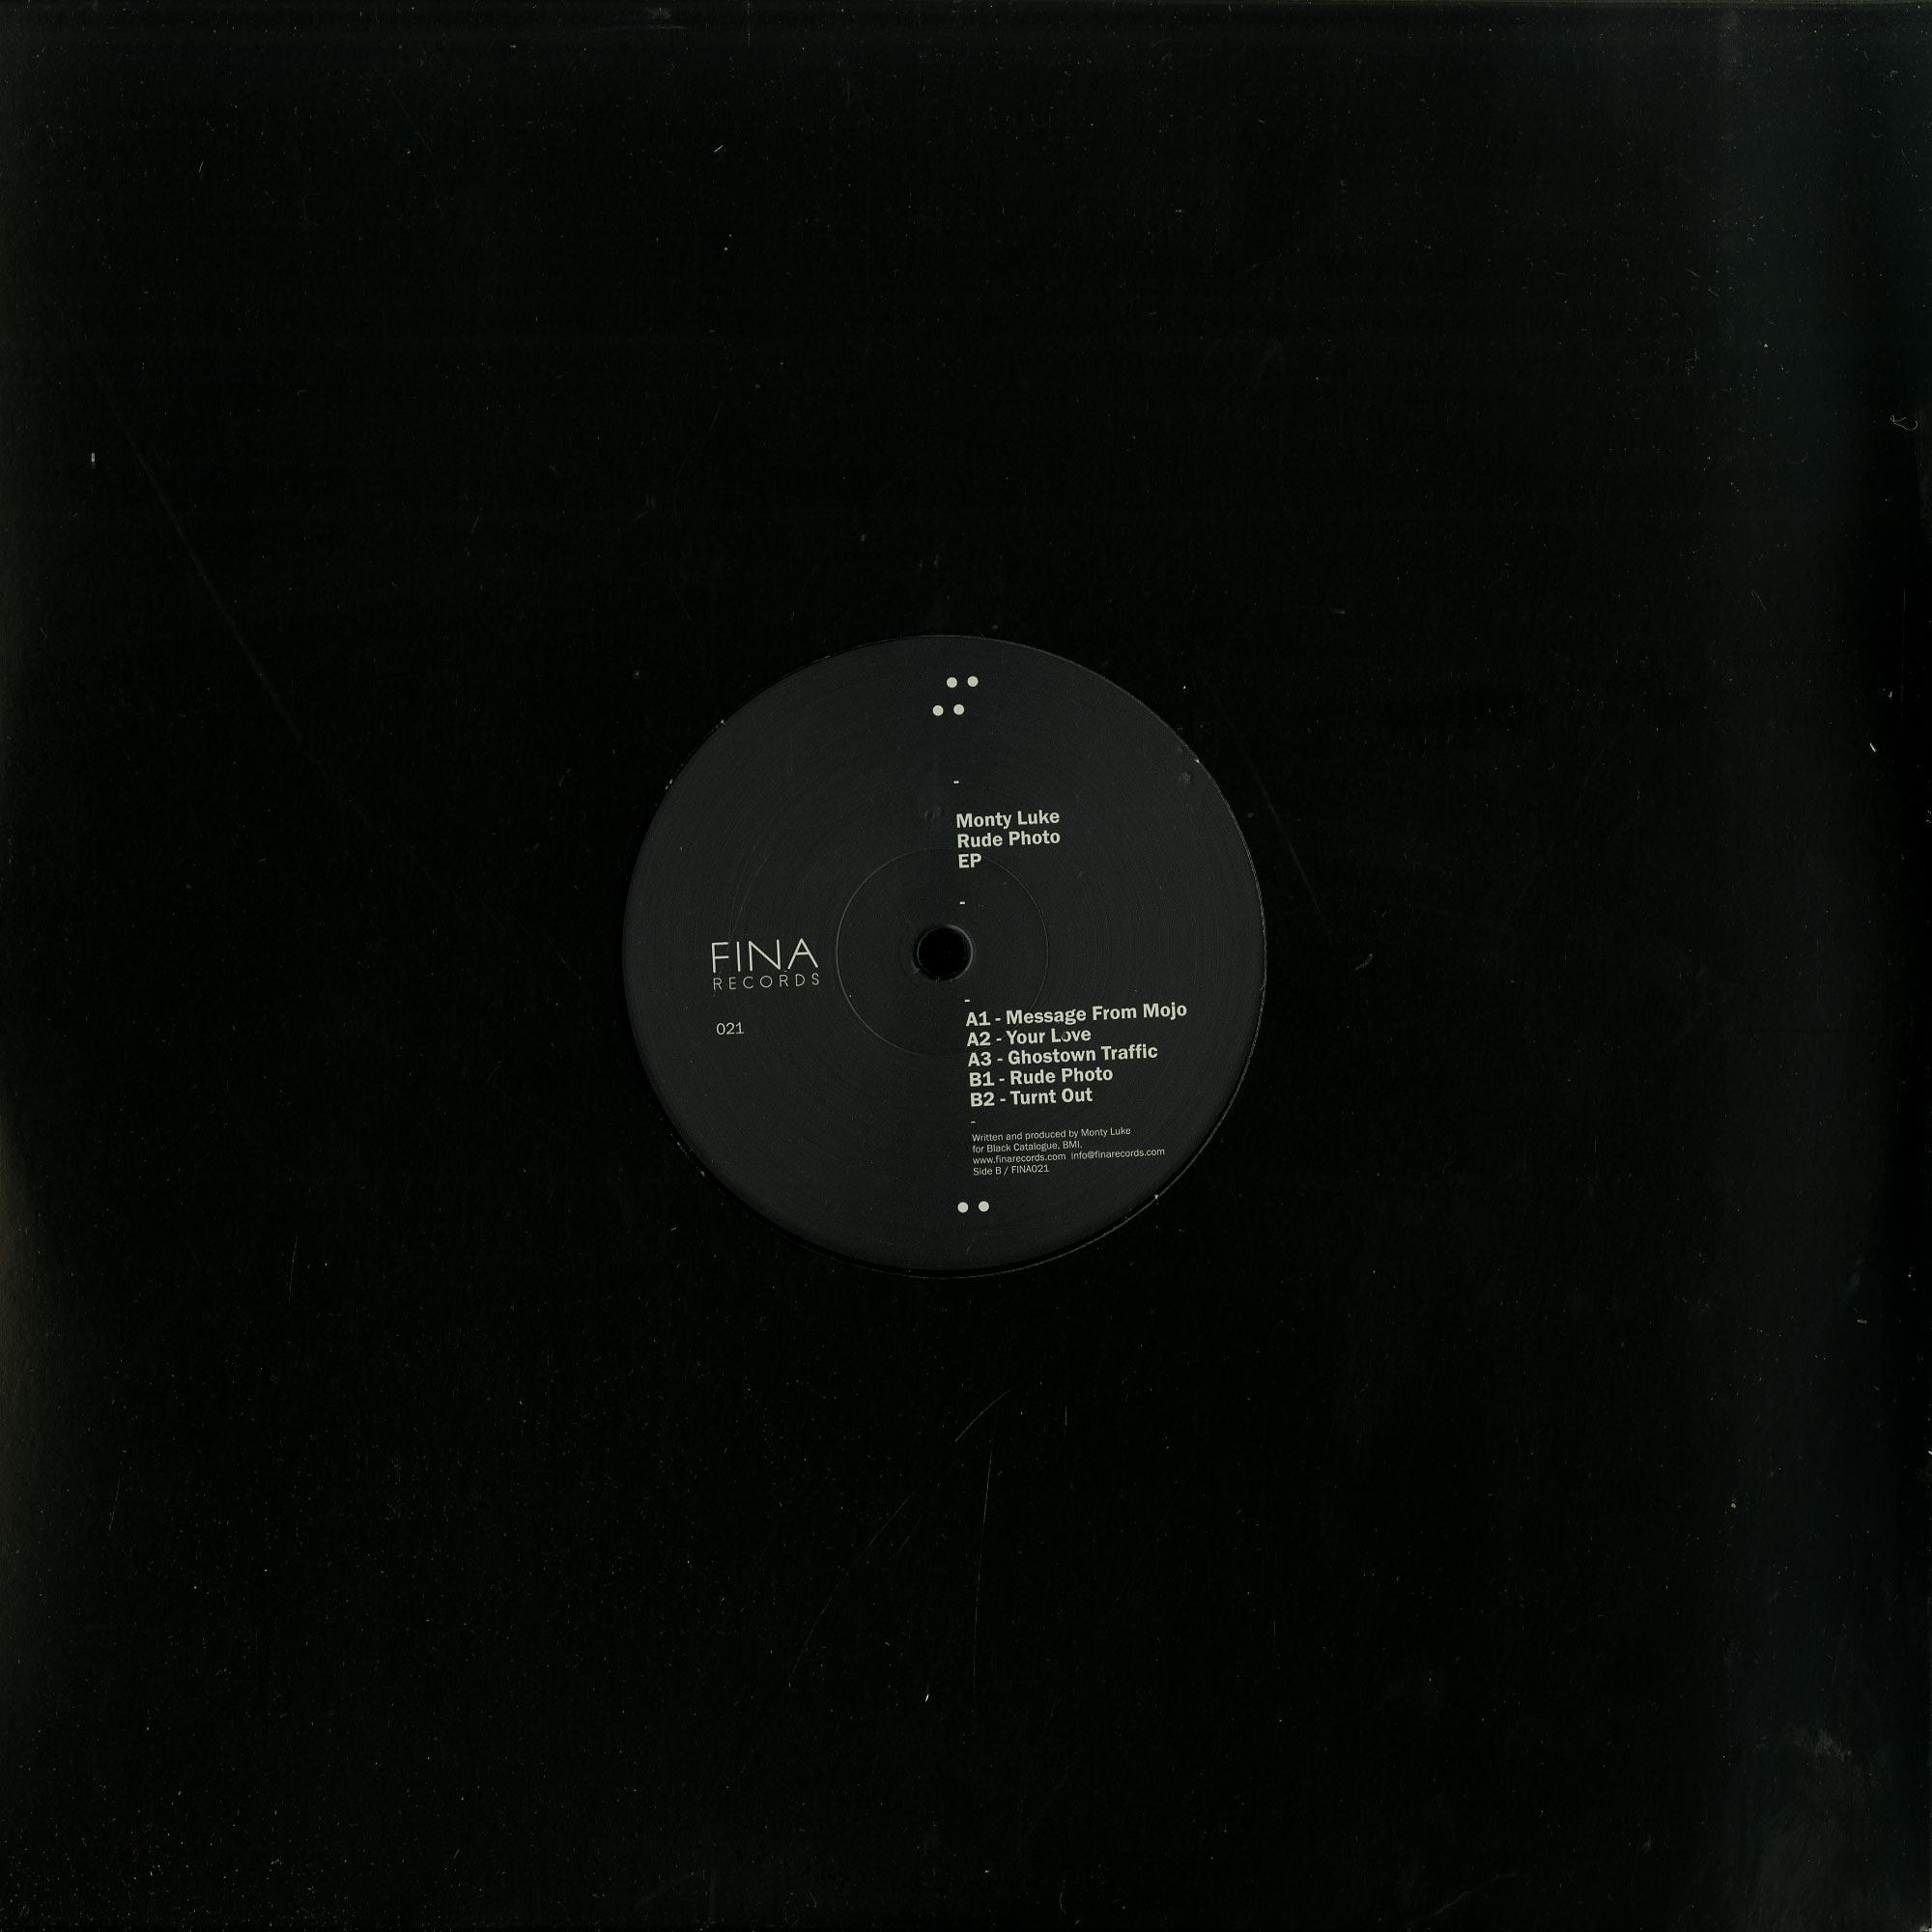 Monty Luke - RUDE PHOTO EP